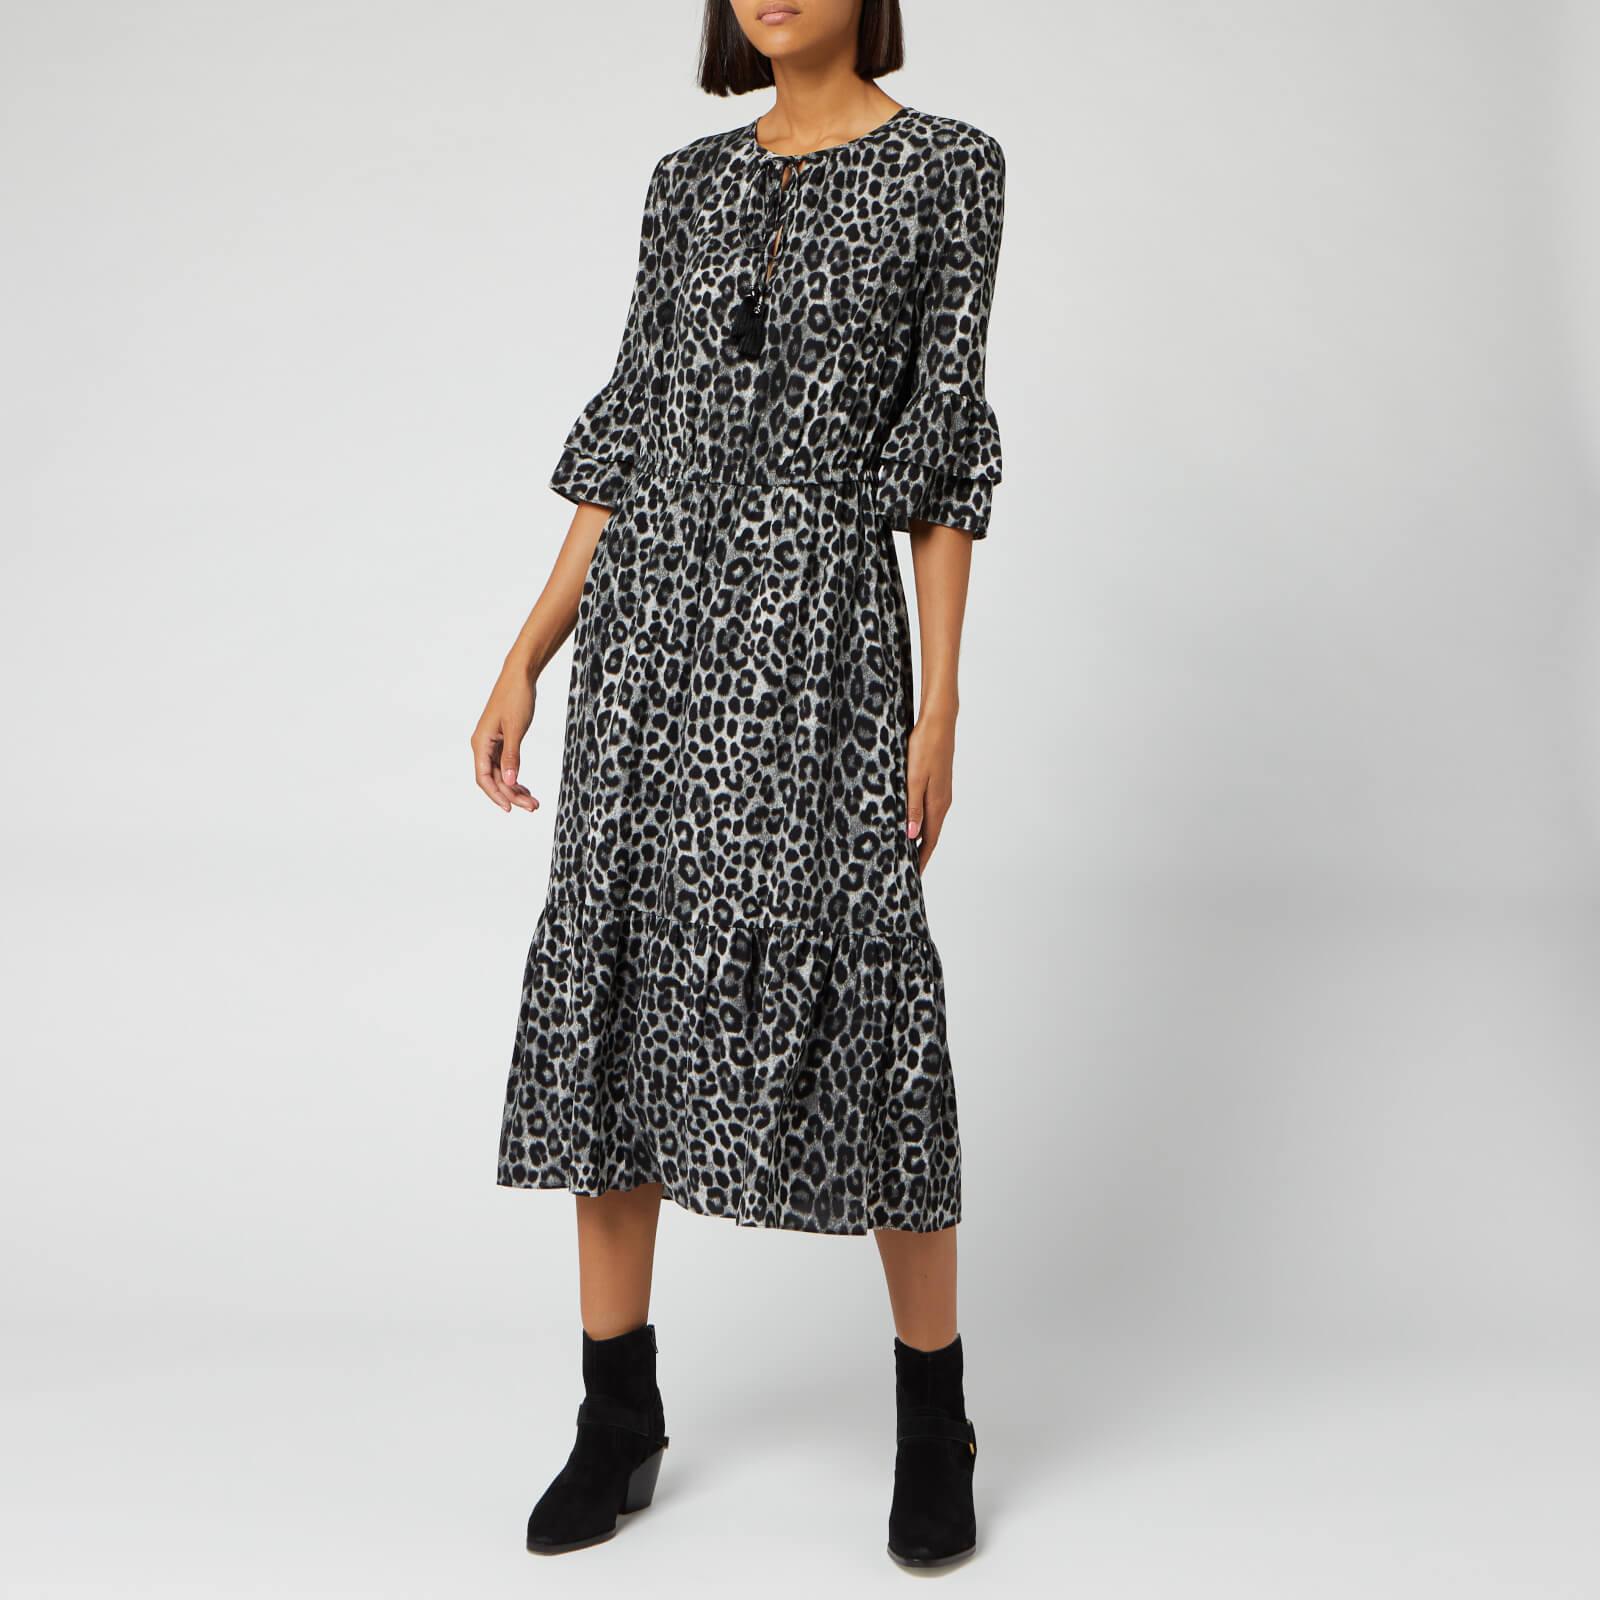 MICHAEL MICHAEL KORS Women's Mega Cheeta Dress - Gunmetal - US 2/UK 6